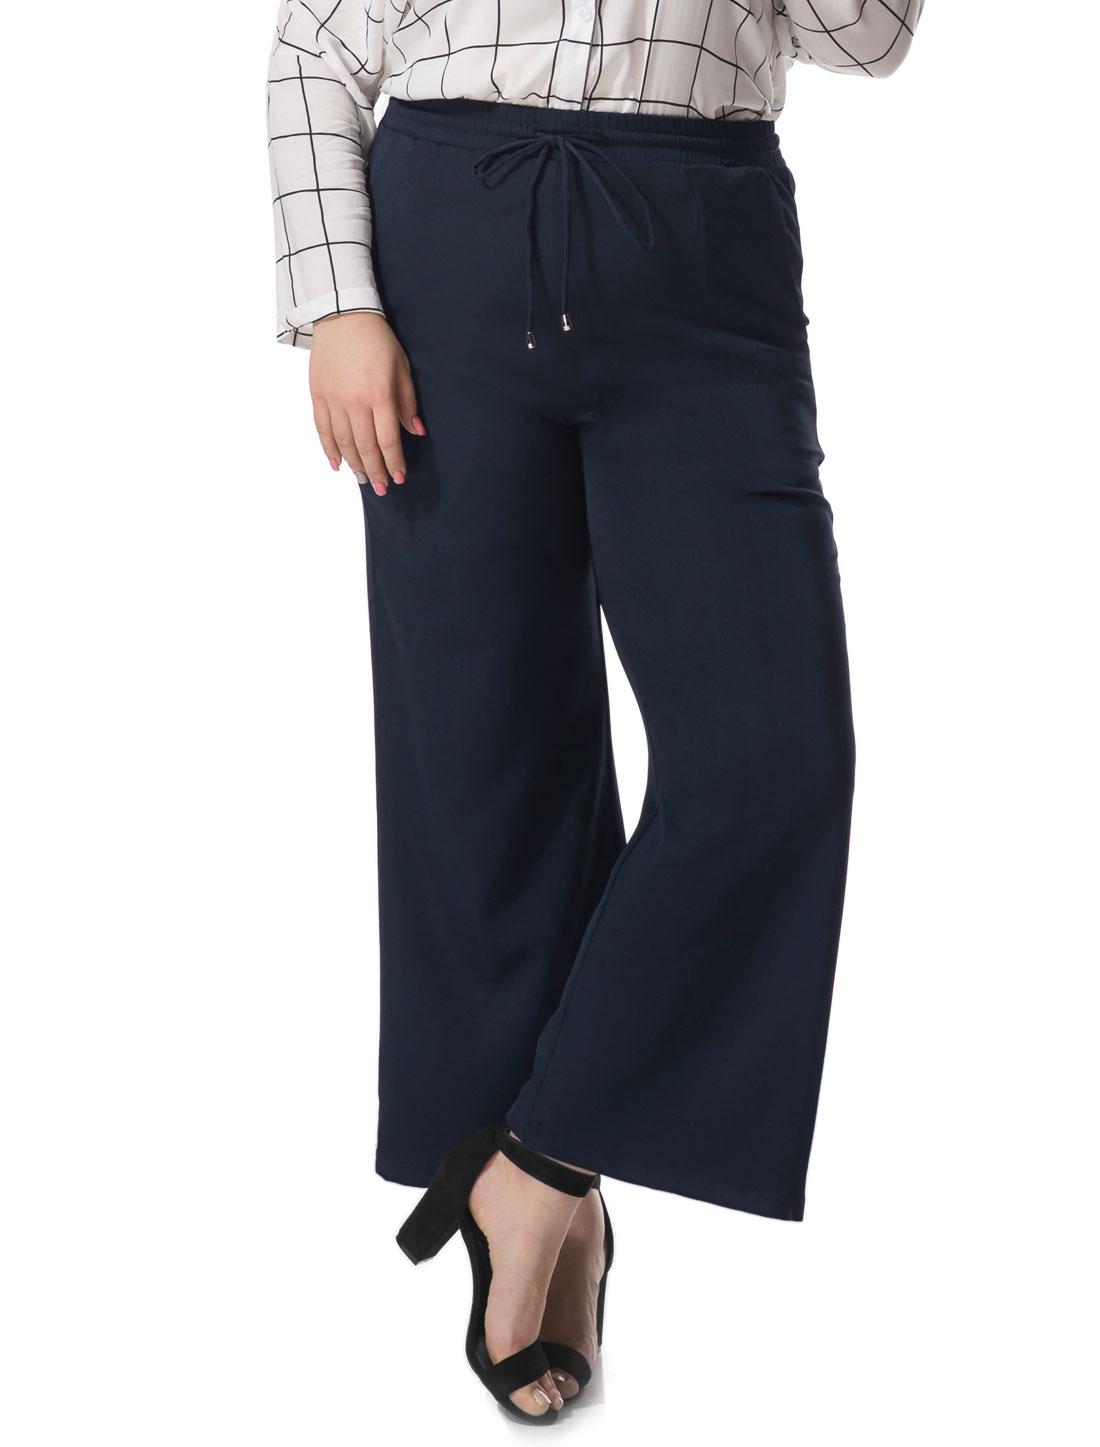 Women Plus Size Wide Leg Elastic Drawstring Pants Blue 1X